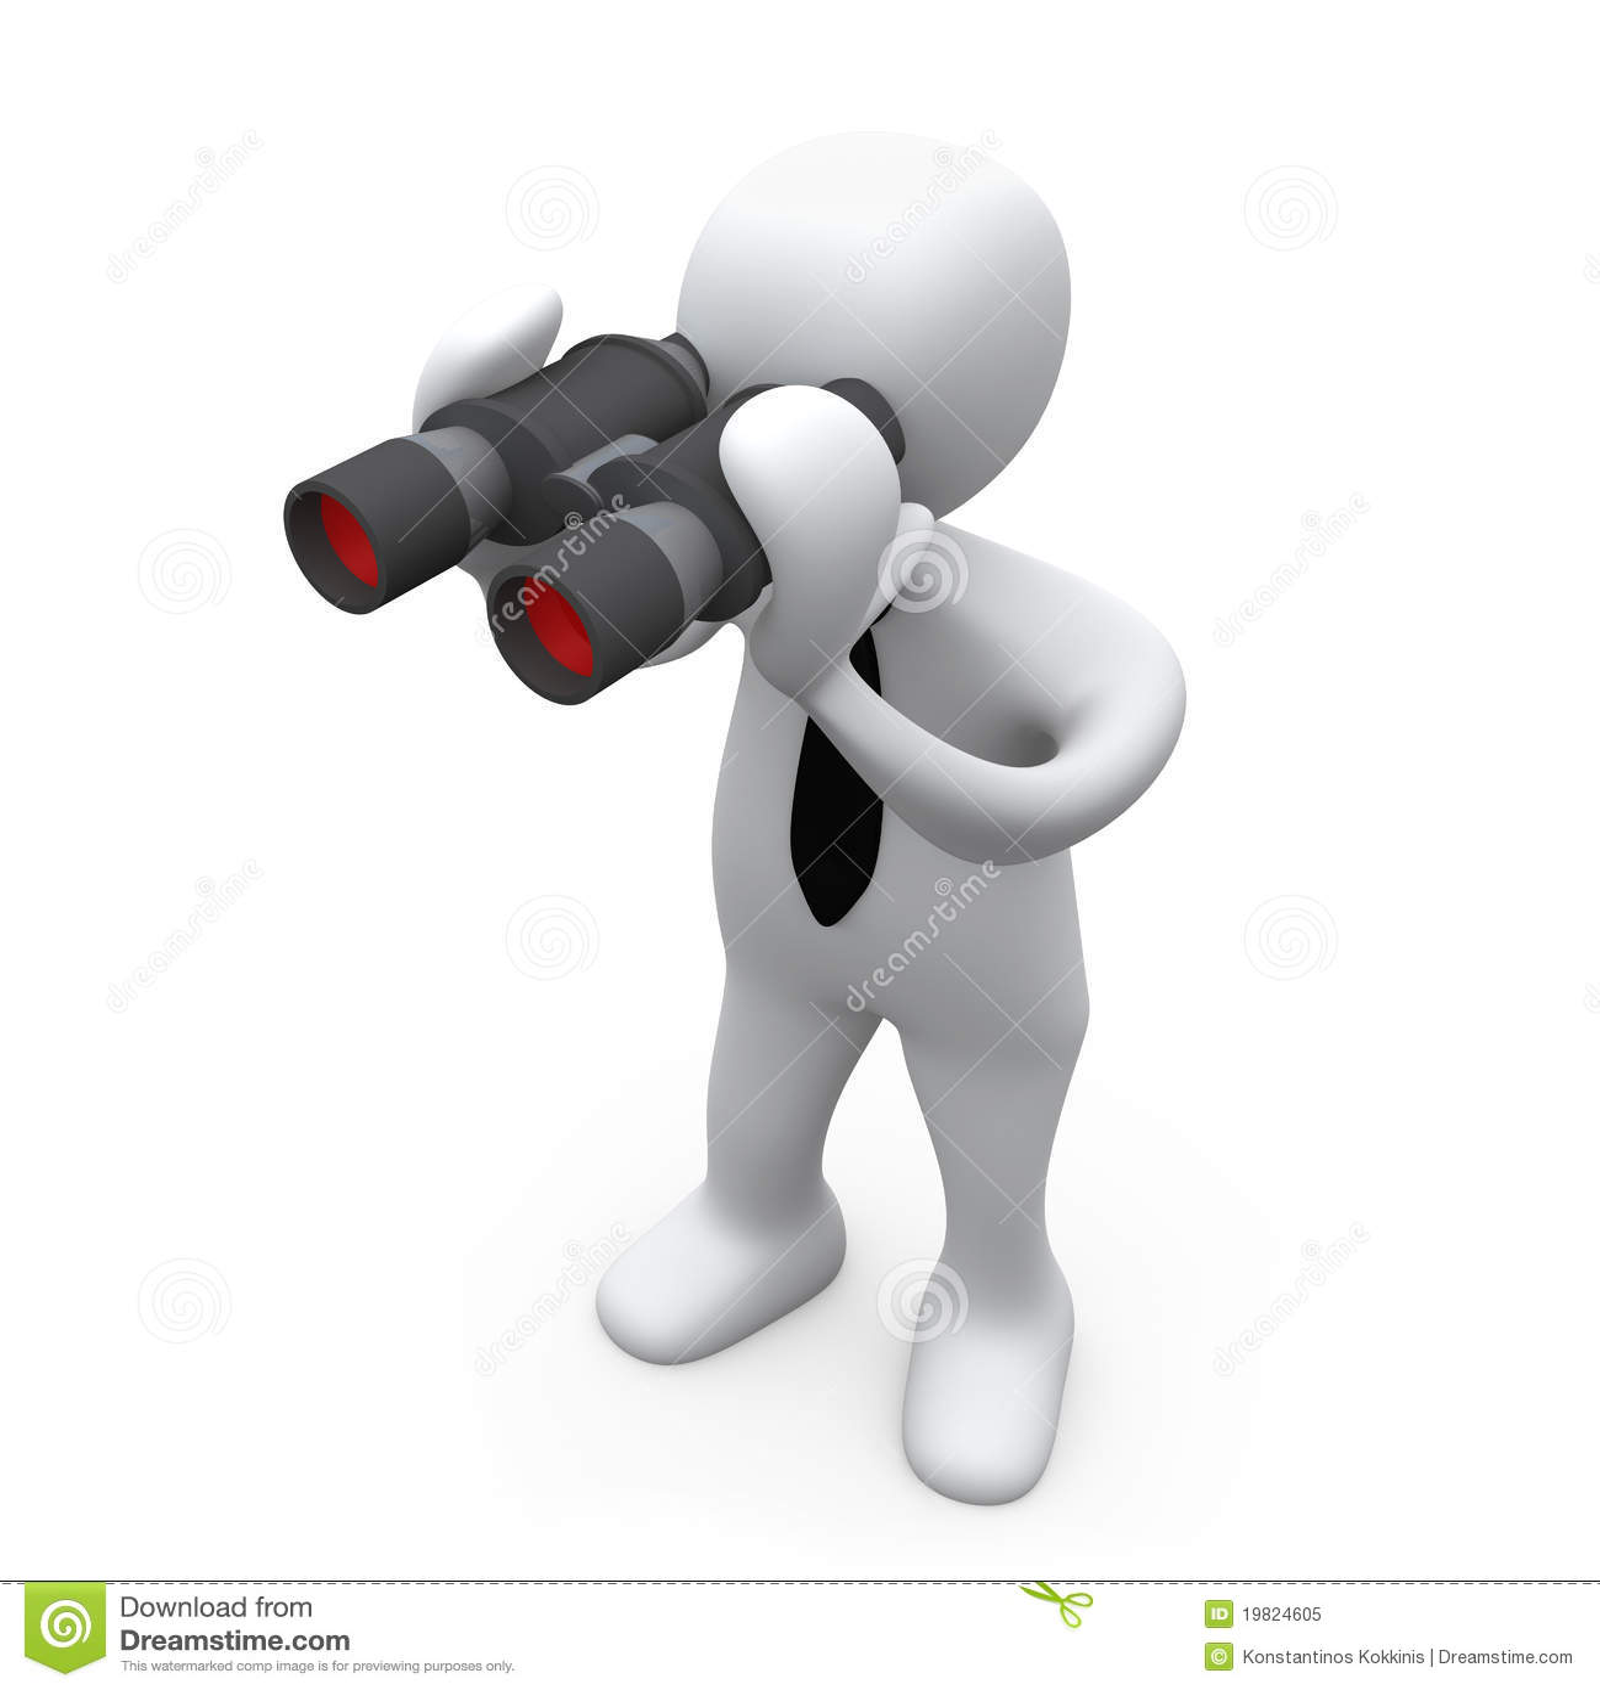 looking through binoculars stock illustration  image of exploration